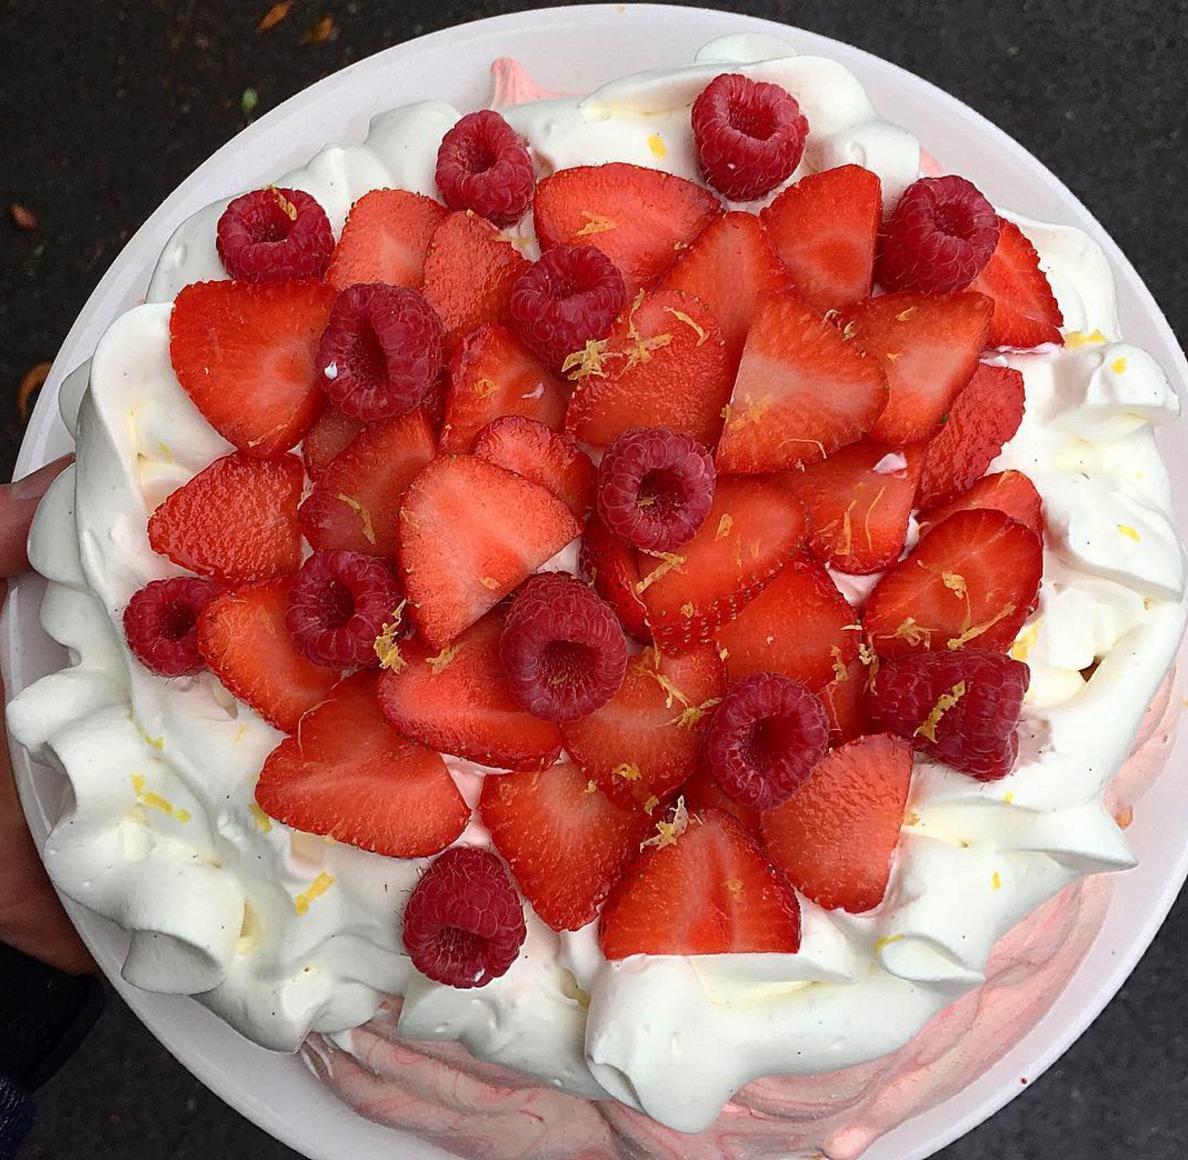 Summer time : Pavlova ou un dessert fruité et léger